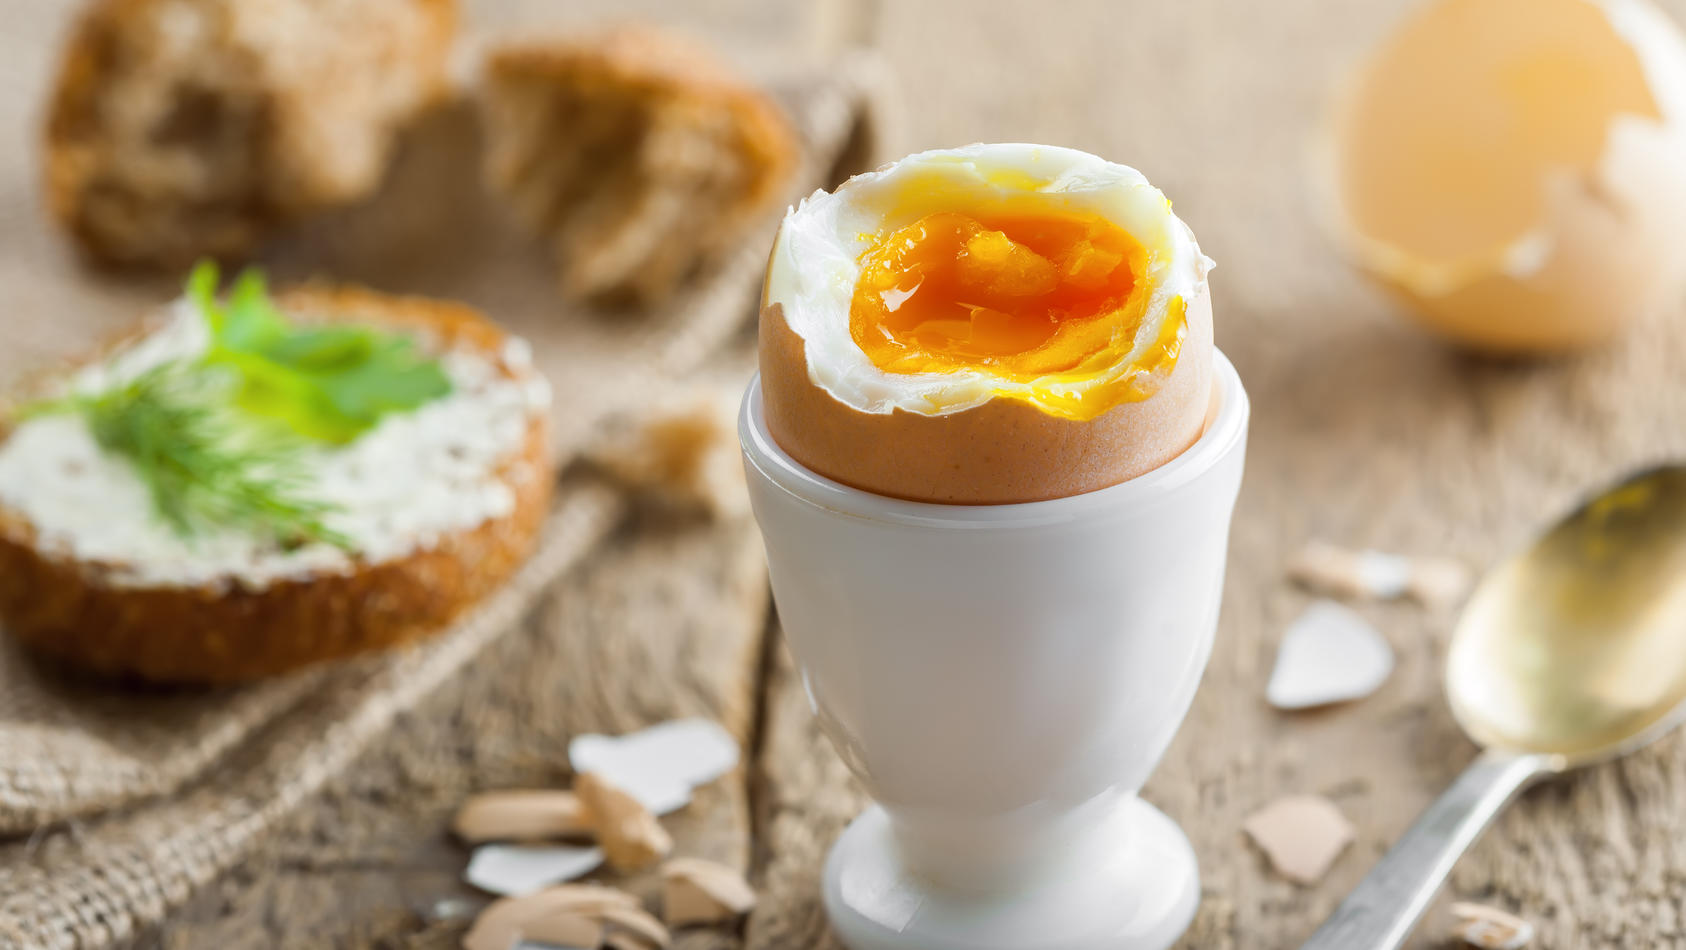 Das perfekte Frühstücksei? Geht ganz leicht!